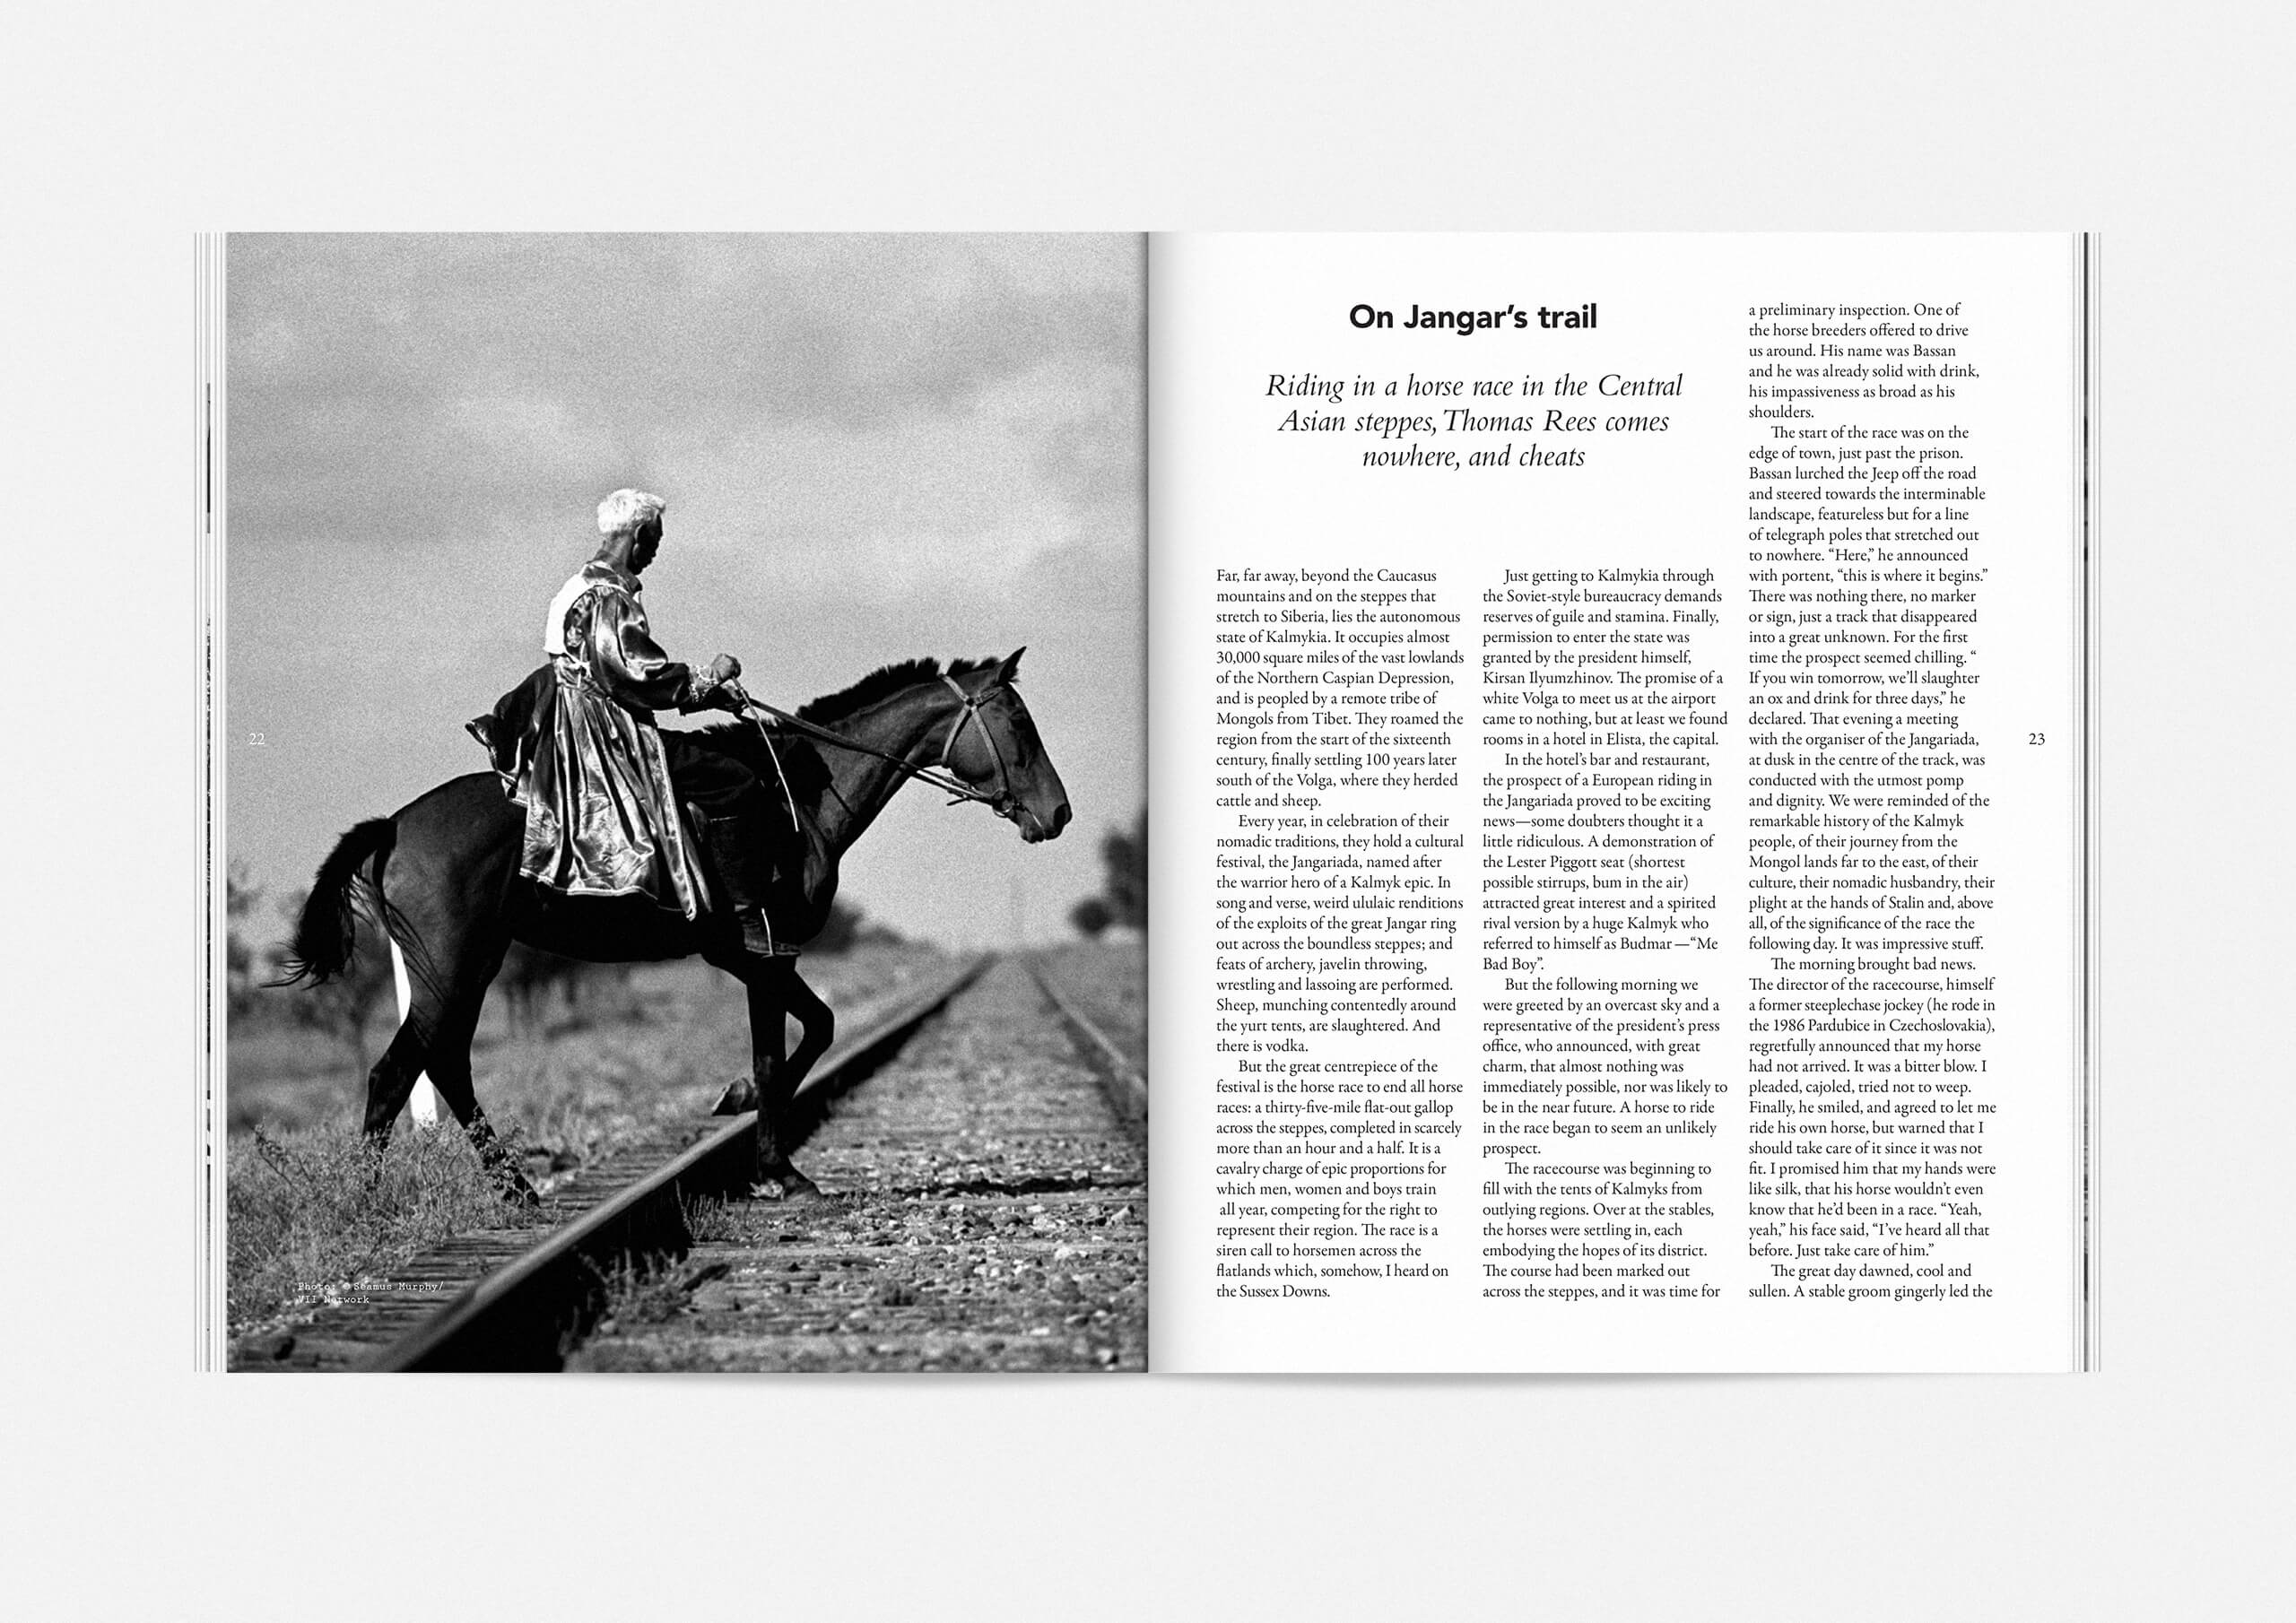 https://neuegestaltung.de/media/pages/clients/teller-magazine-issue-1/e83913b4d8-1597415428/teller_issue_01_innenseite_22_23_ng.jpg